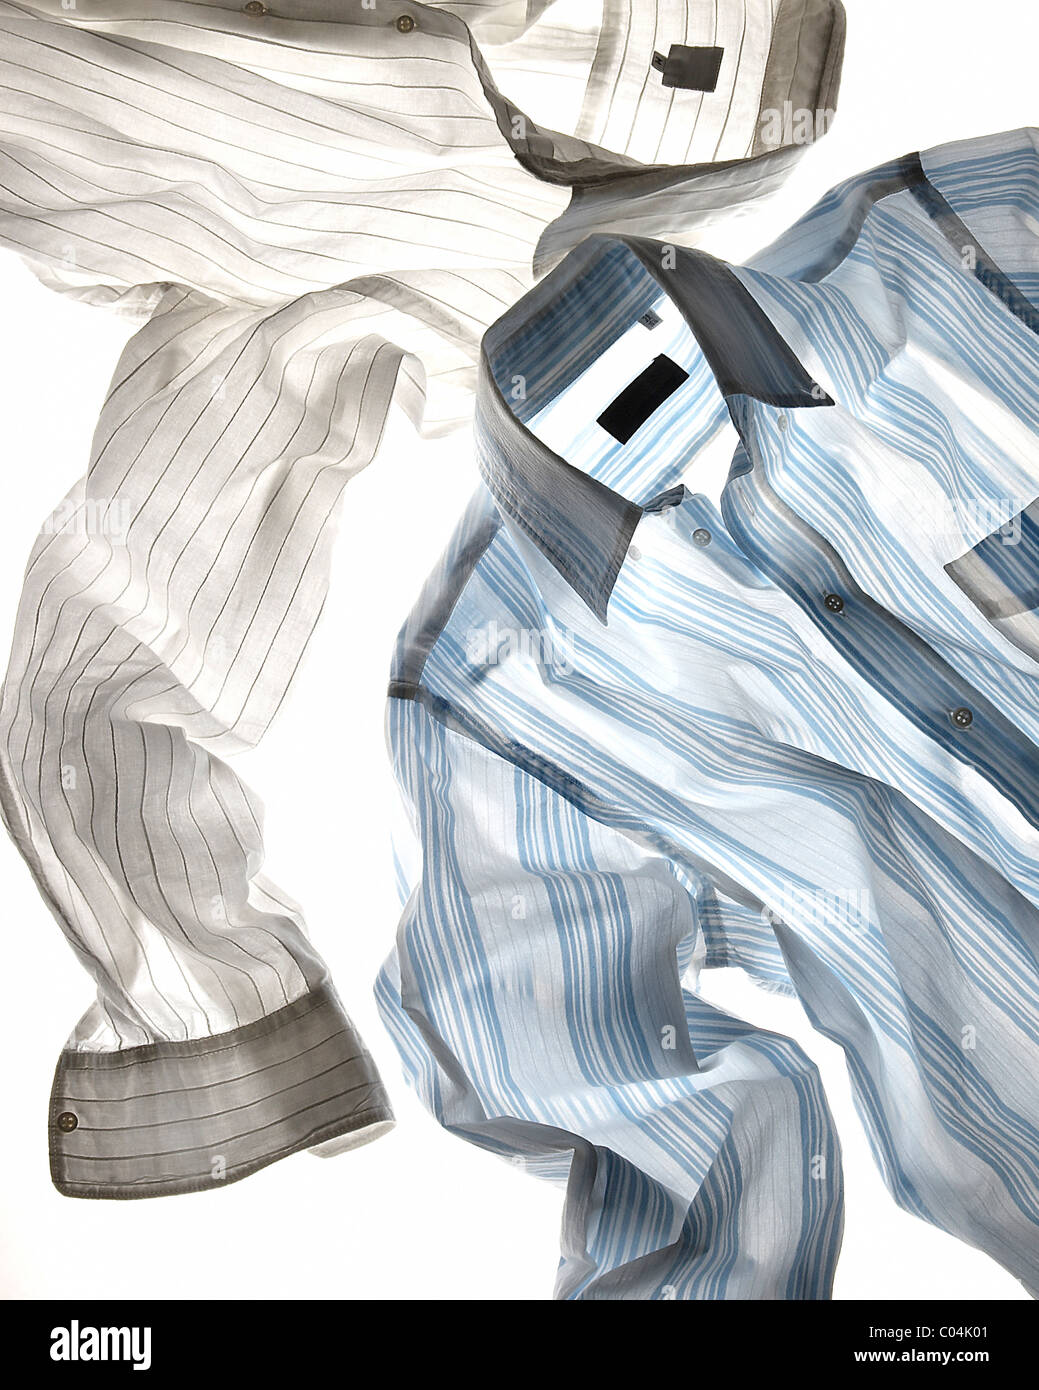 Chemise rayée blanc et bleu baklite Photo Stock